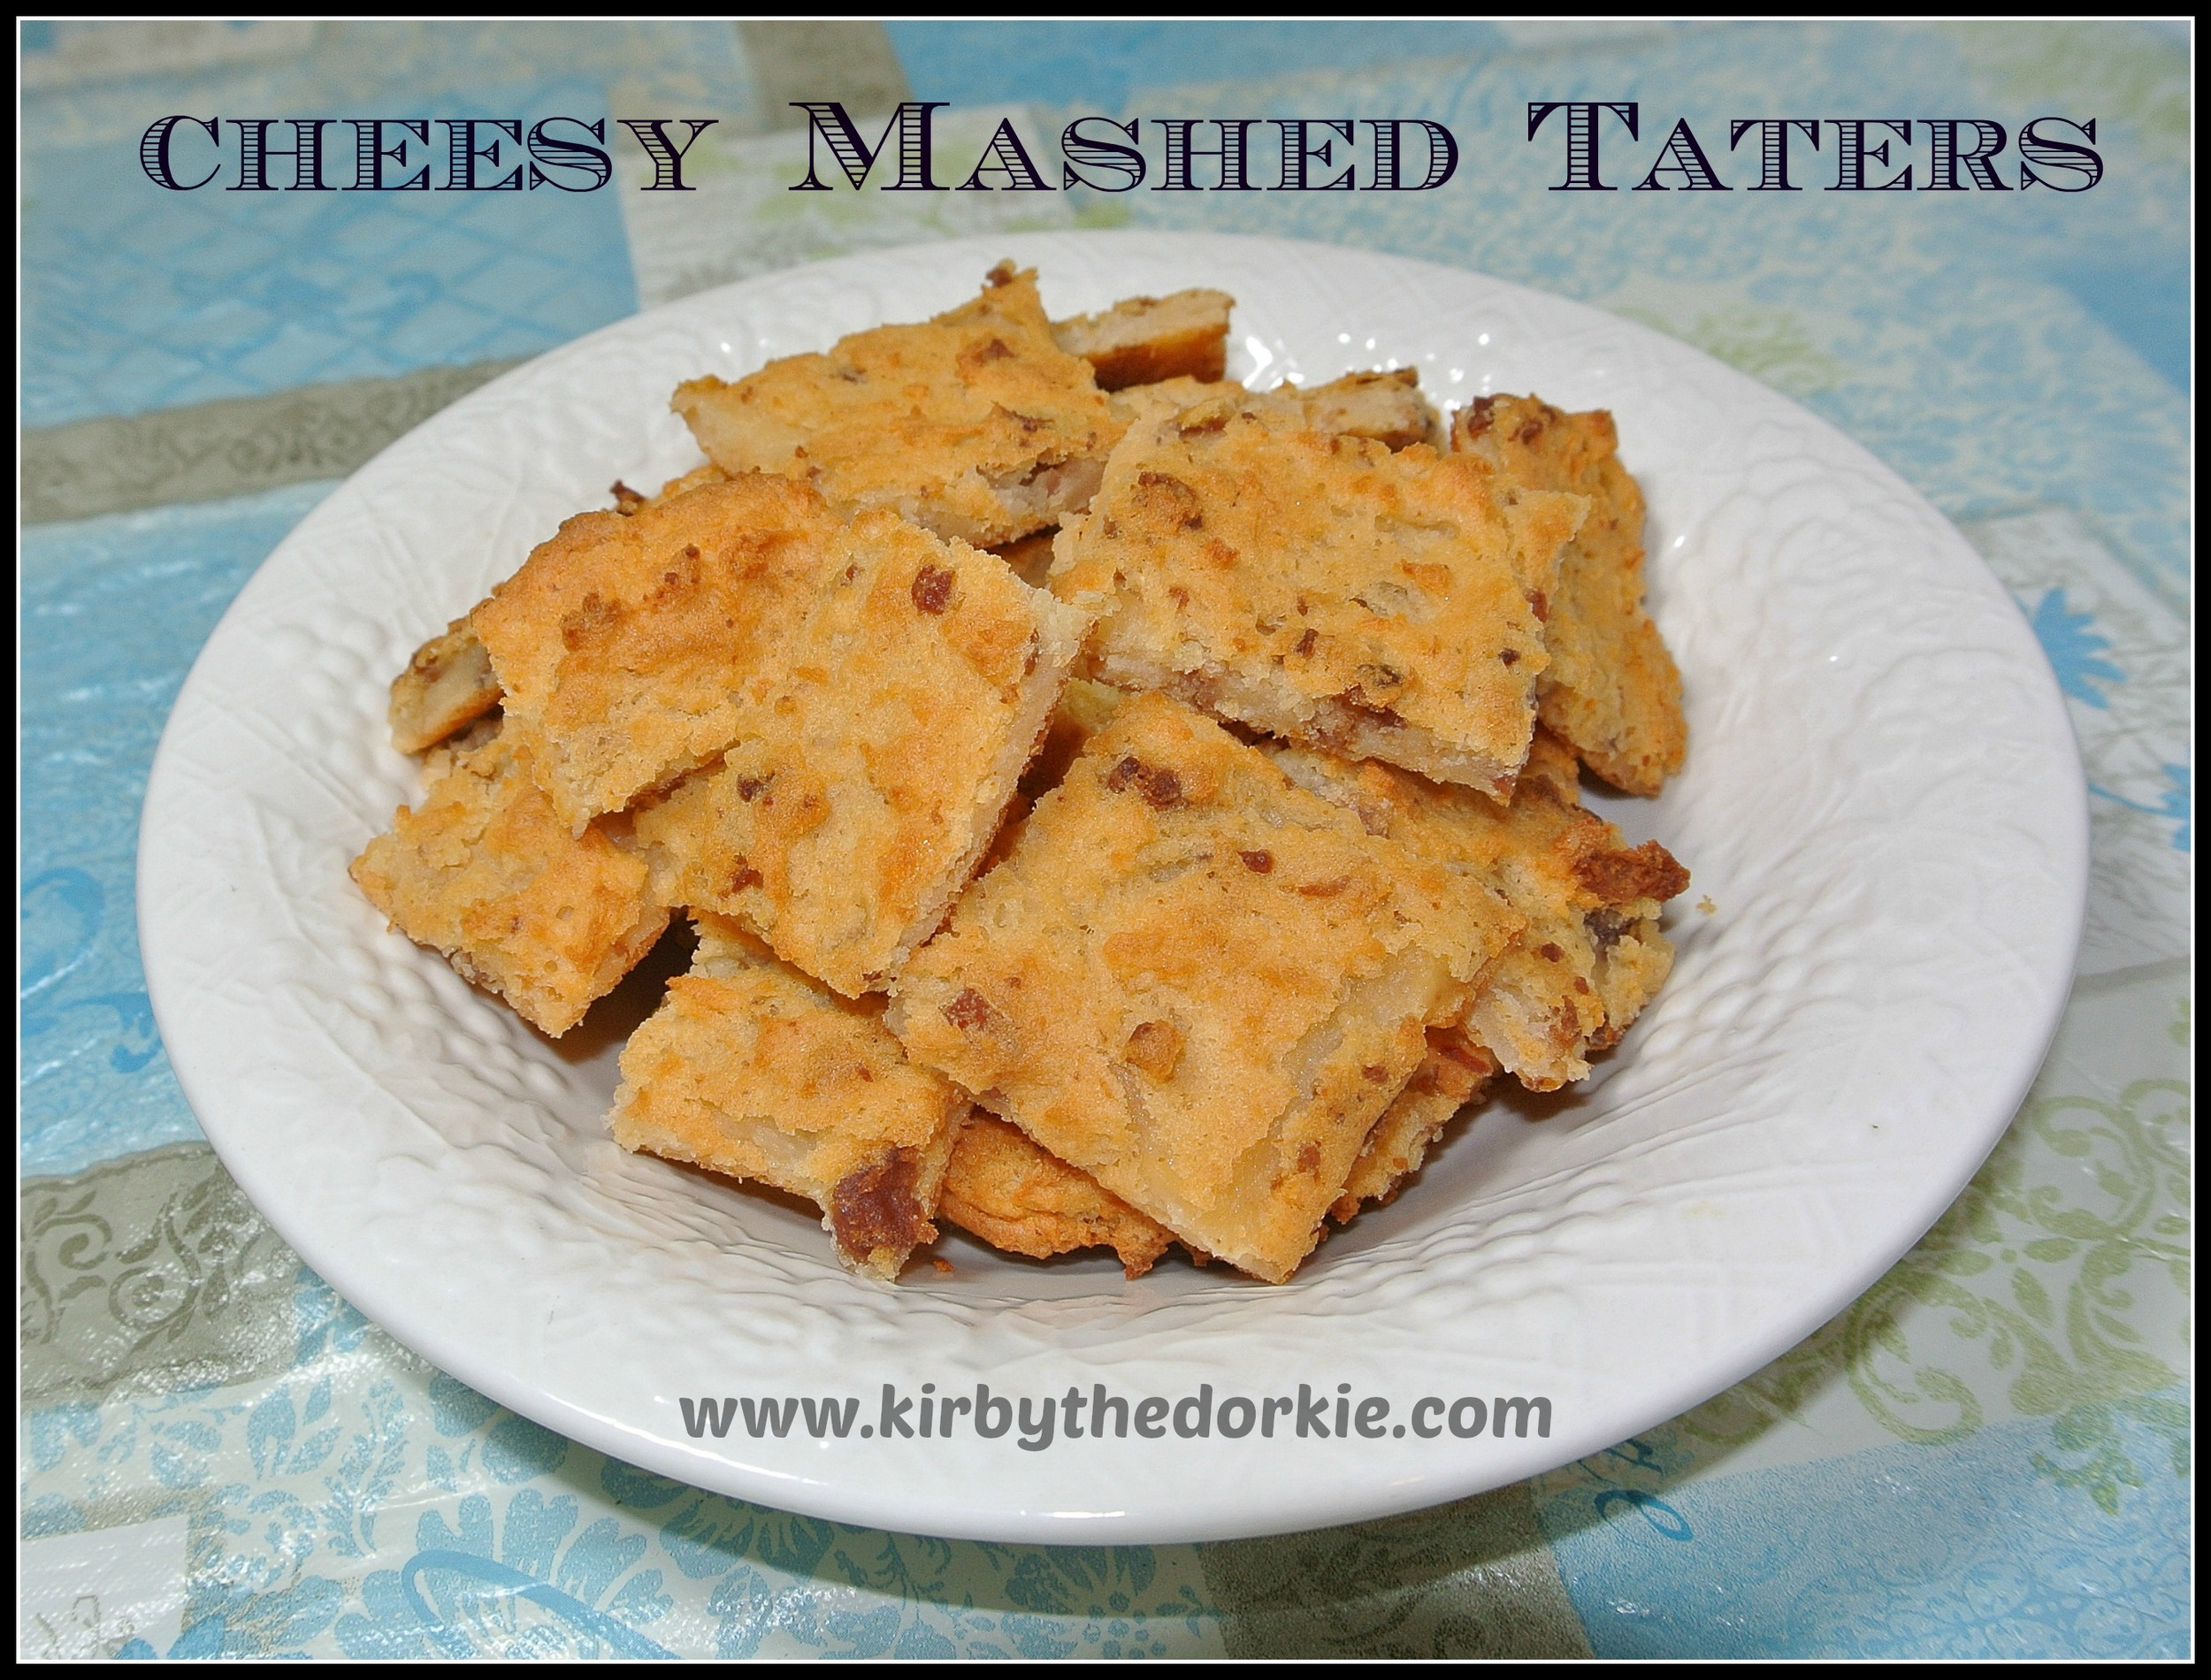 Cheesy Mashed Taters